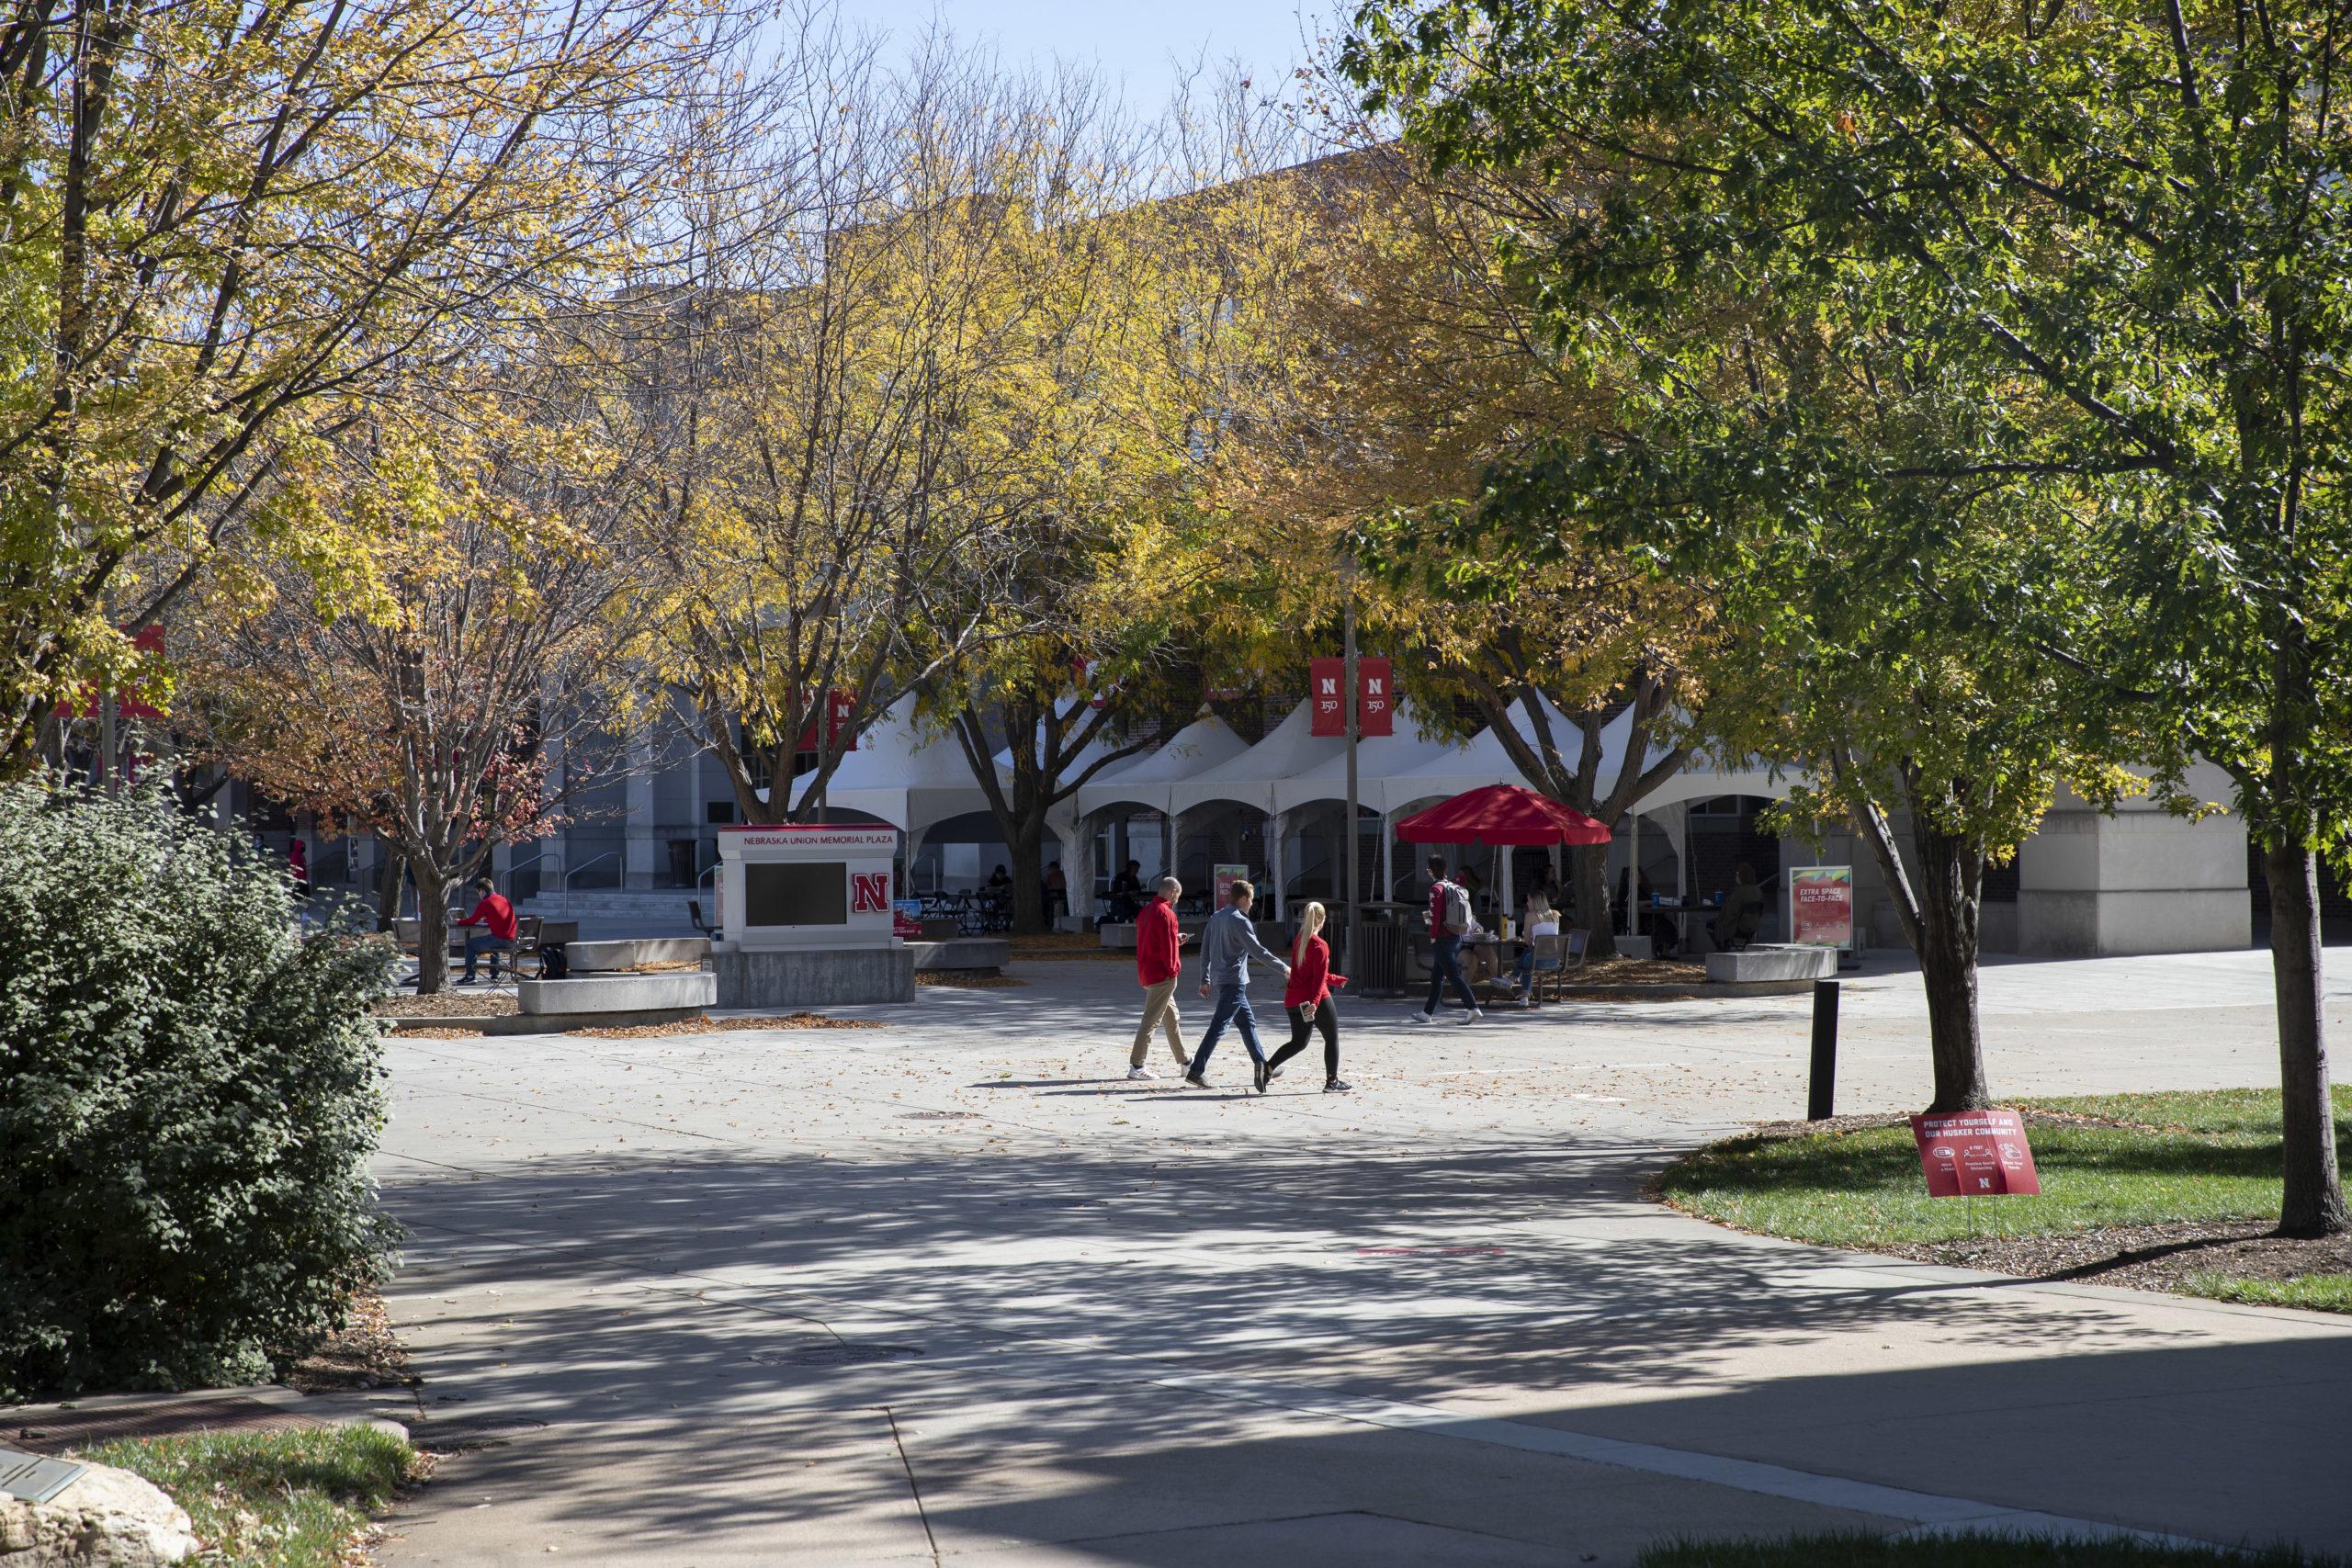 Students and faculty walk across the University of Nebraska-Lincoln campus near the Nebraska Union on Tuesday, October 13, 2020 in Lincoln, Nebraska.